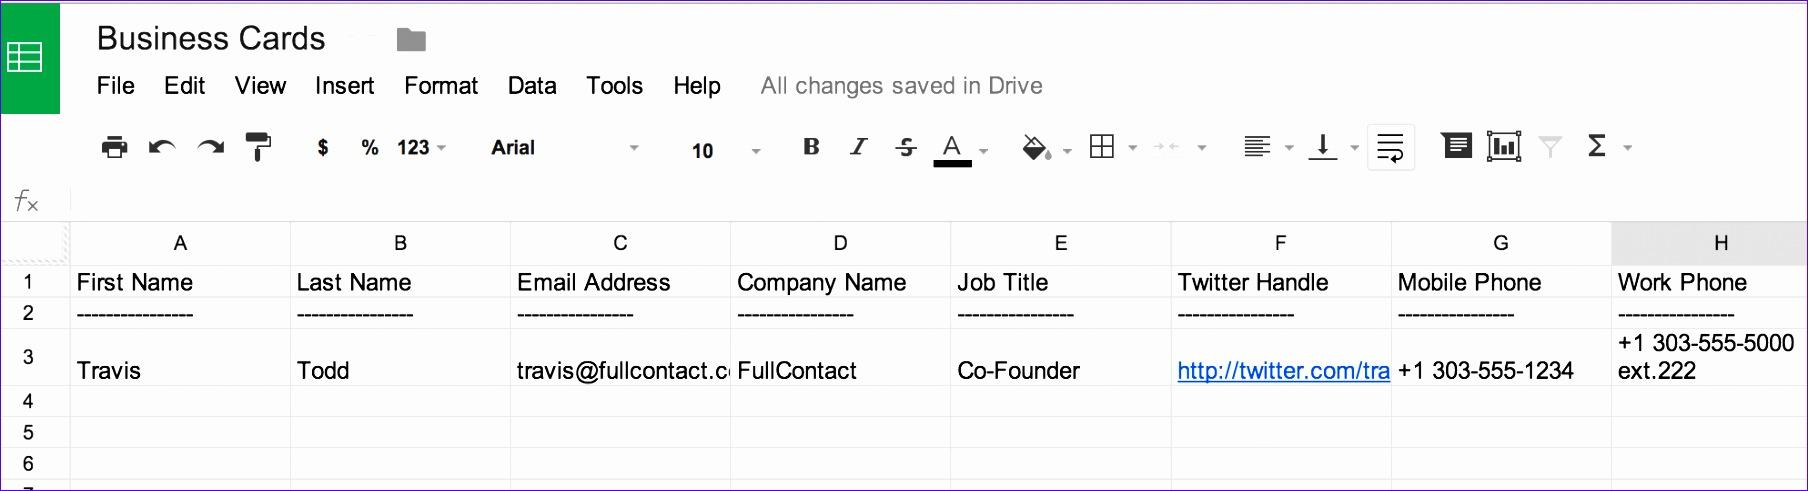 business card data in spreadsheet